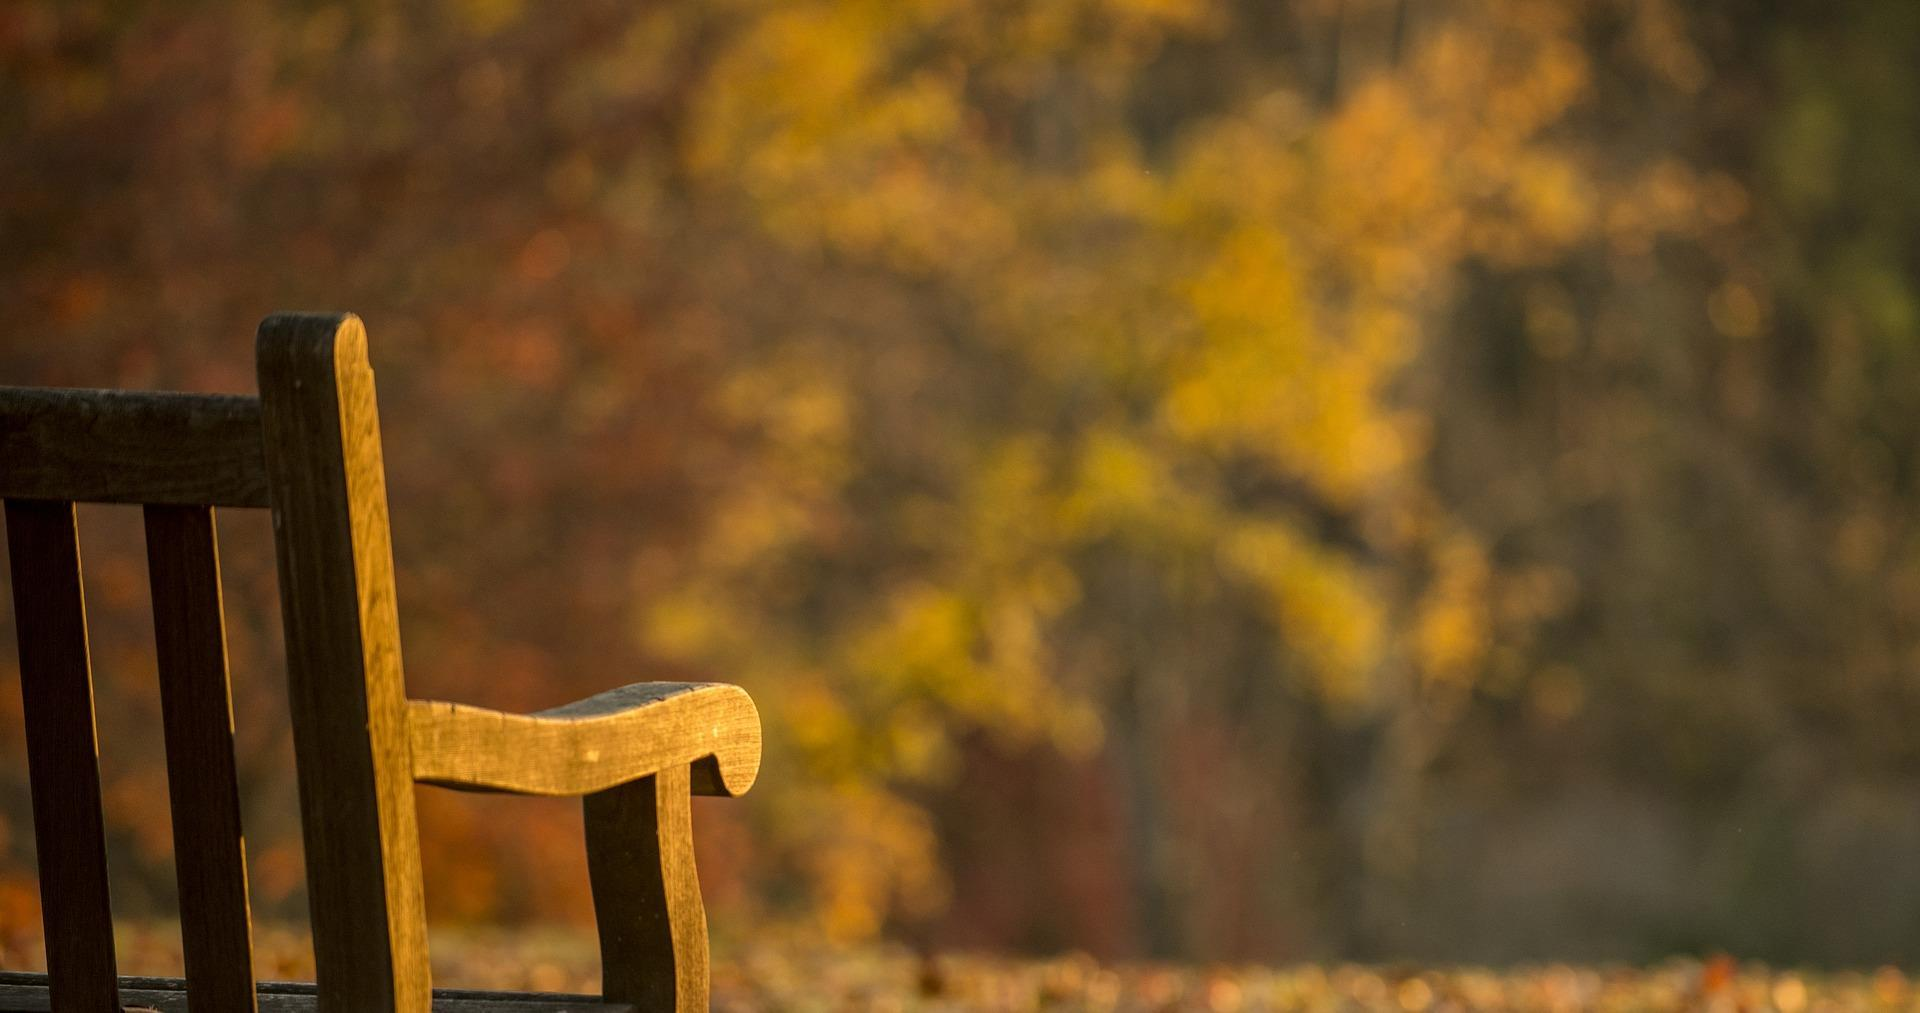 arrivee-automne_calme-et-repos